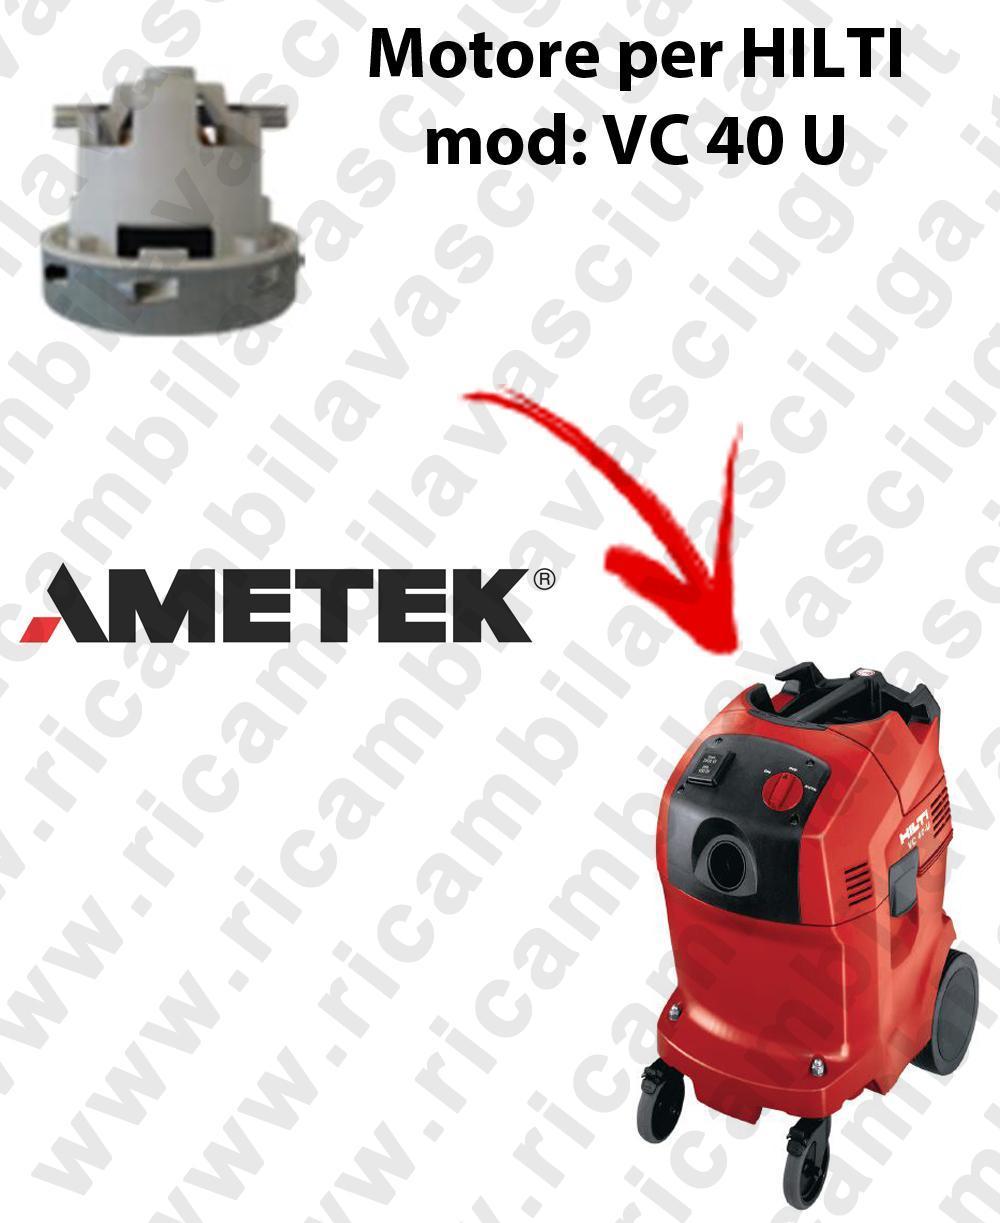 VC 40 U automatic Motore de aspiración AMETEK para aspiradora HILTI